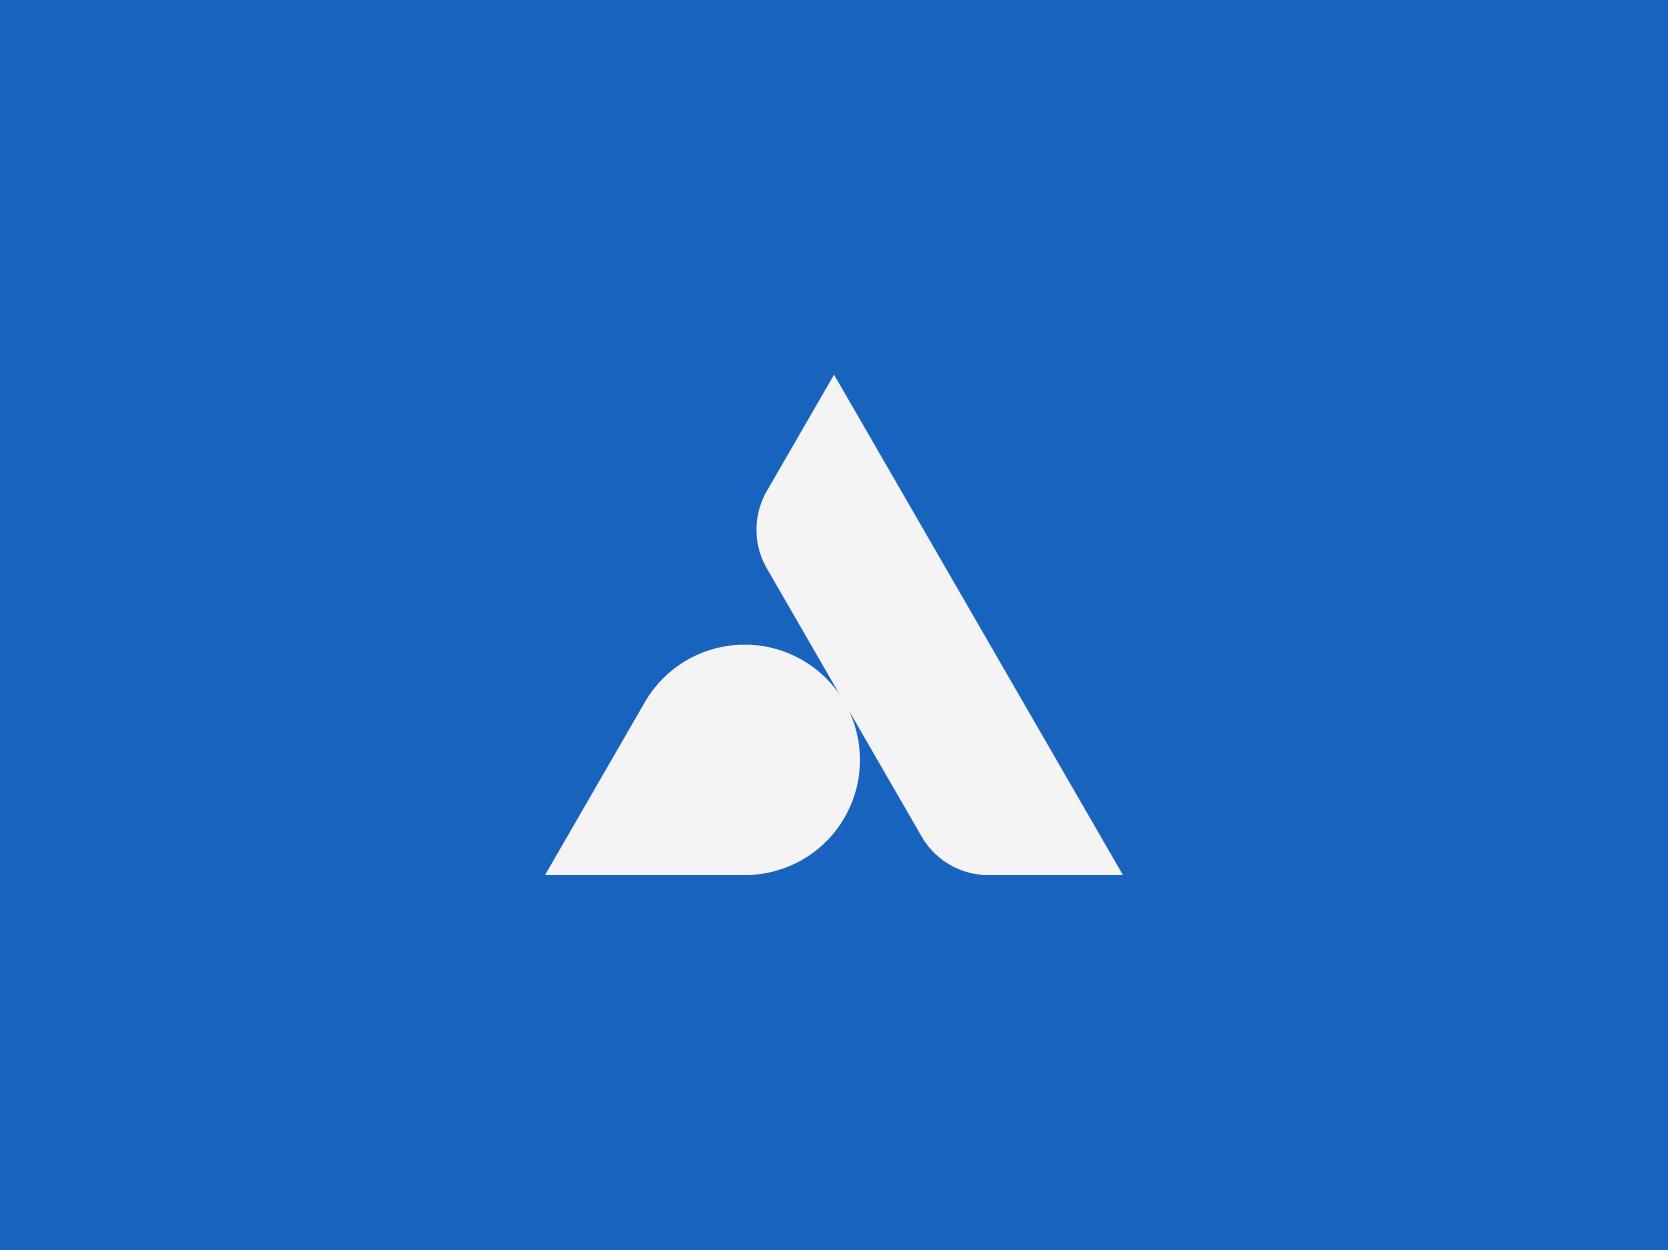 Triangle1 01